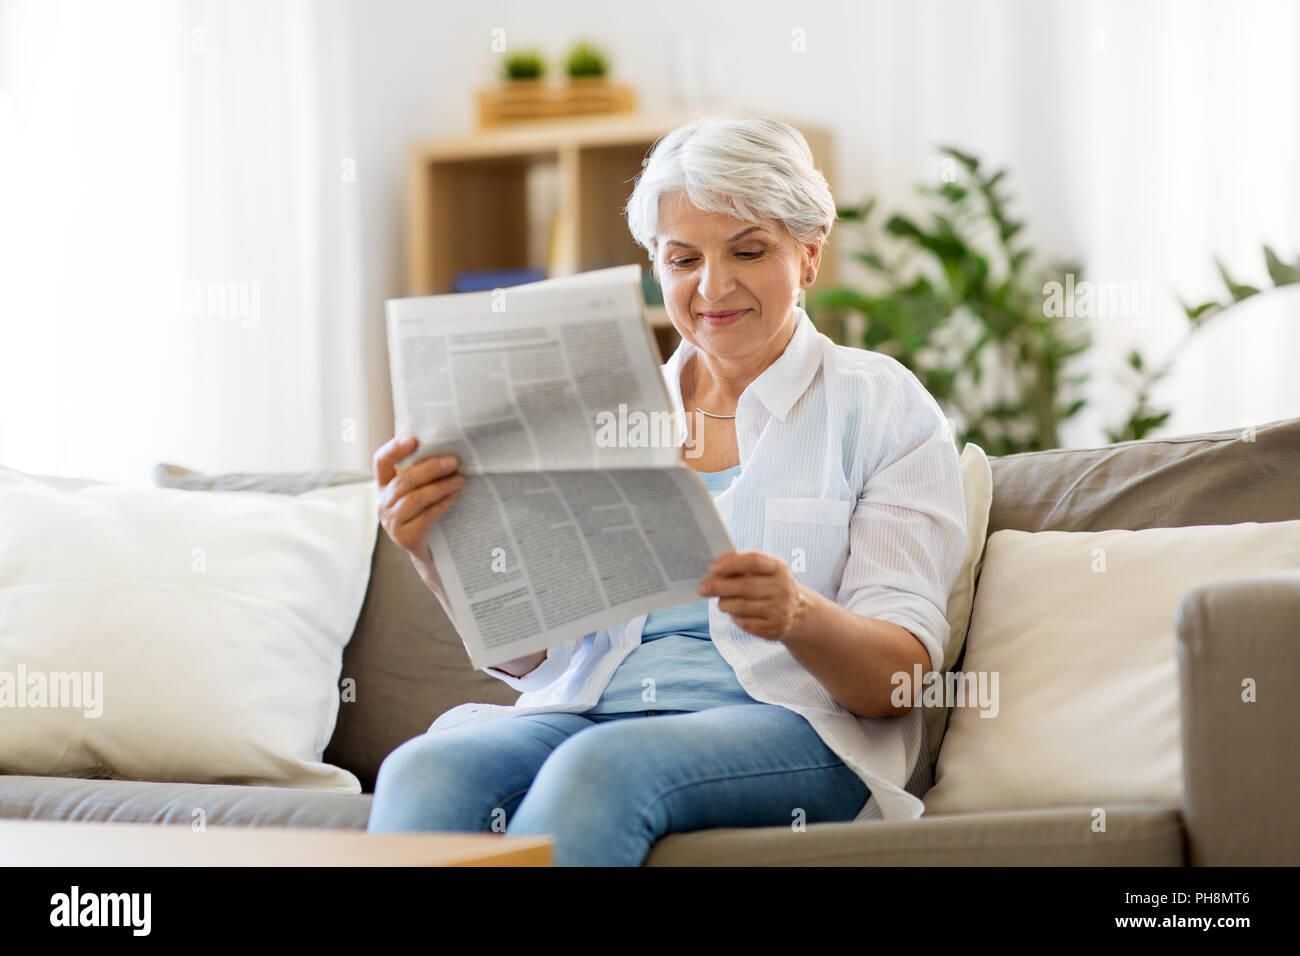 senior woman reading newspaper at home stock photo: 217165542 - alamy